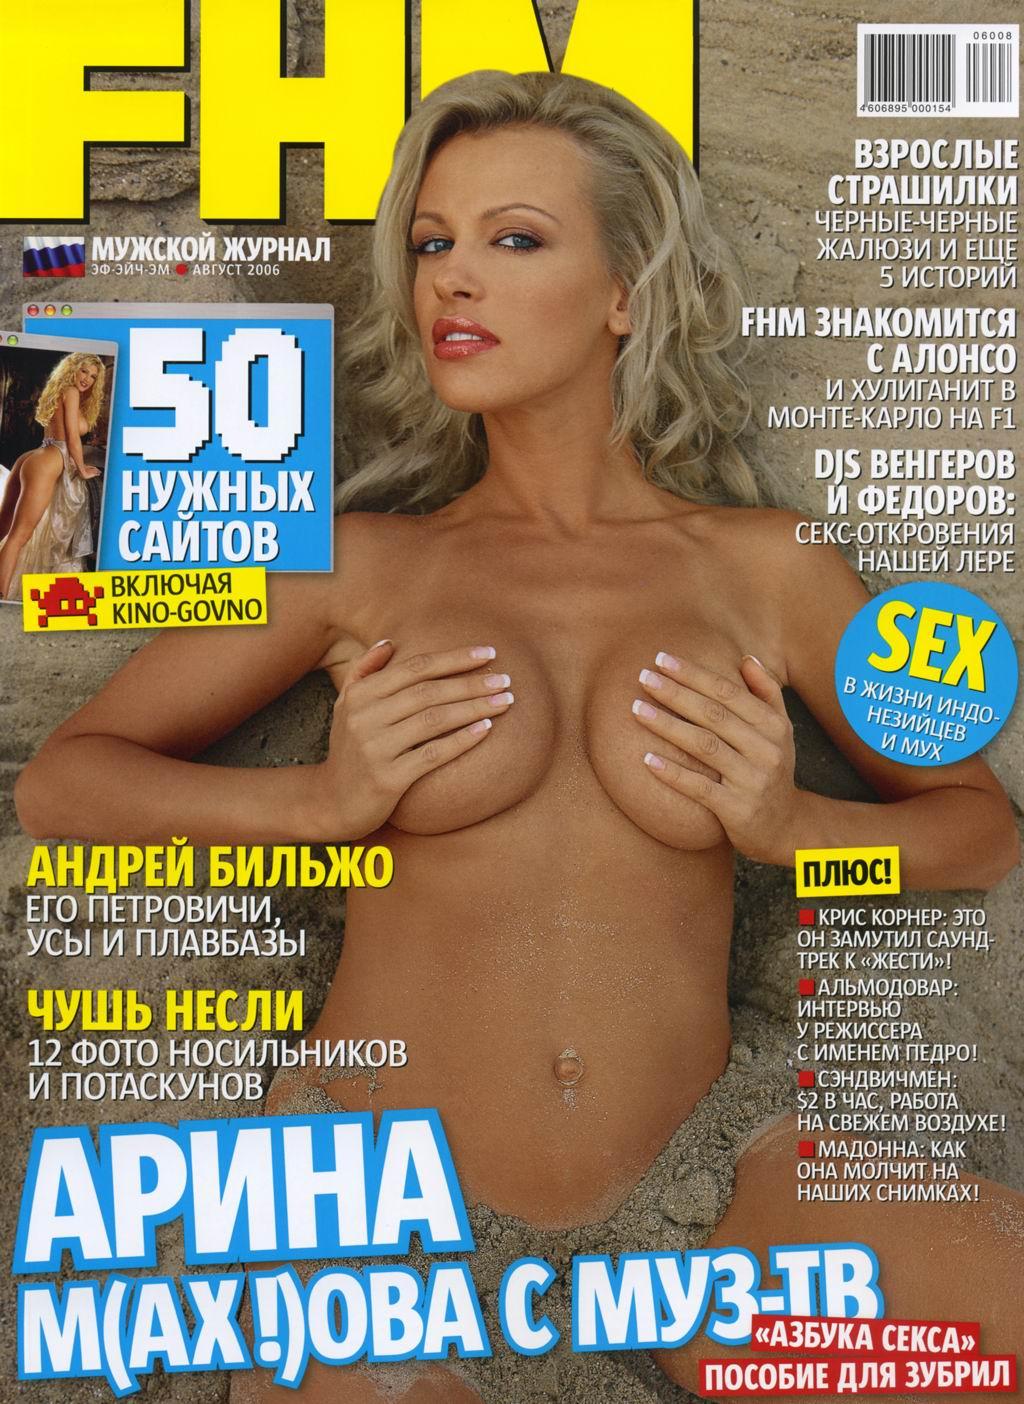 9-porno.ru Порно арина махова